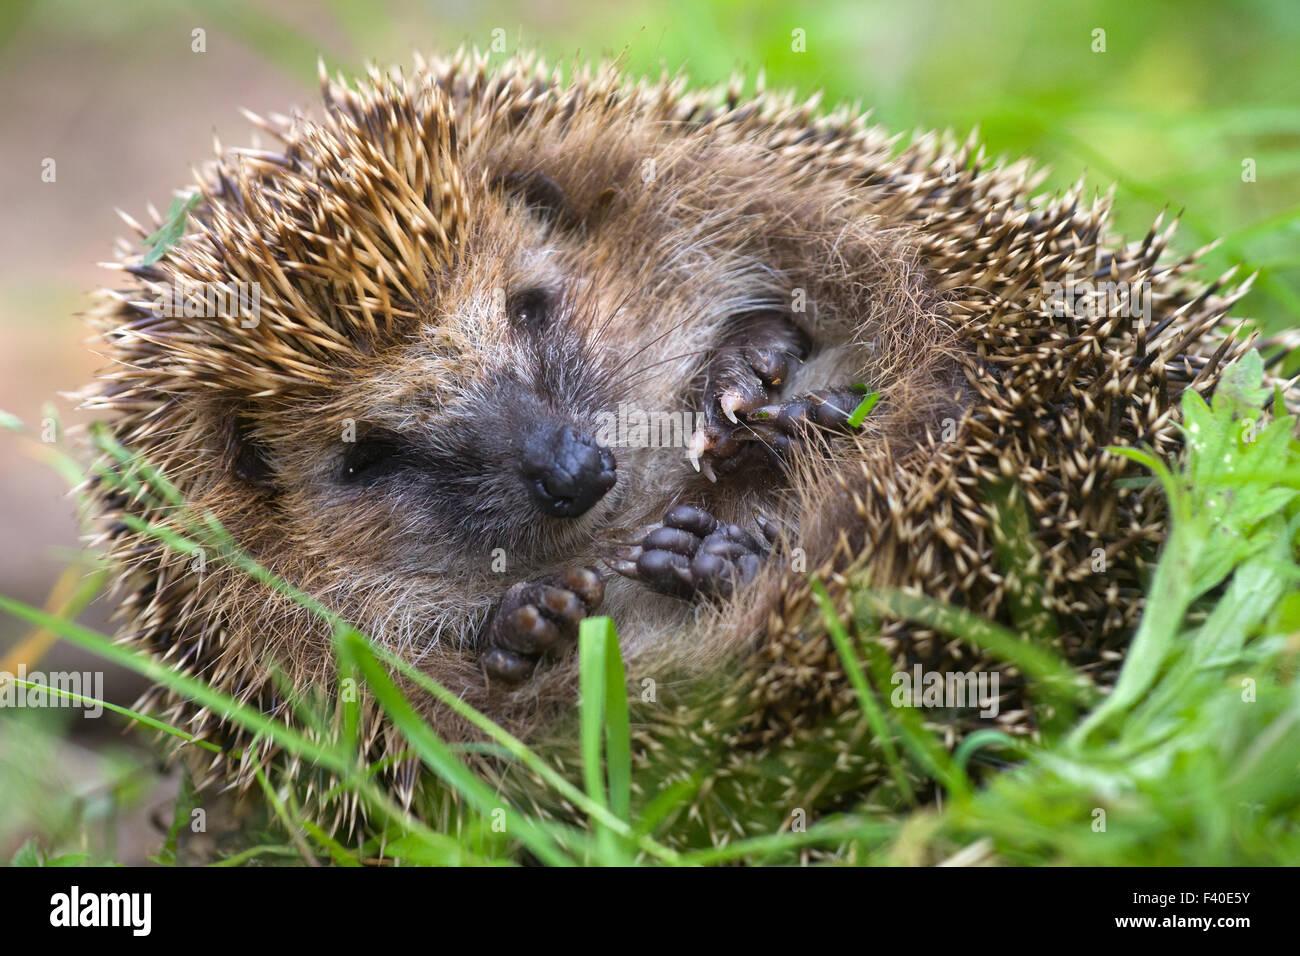 hedgehog curled  and sleeps ant awakes him - Stock Image